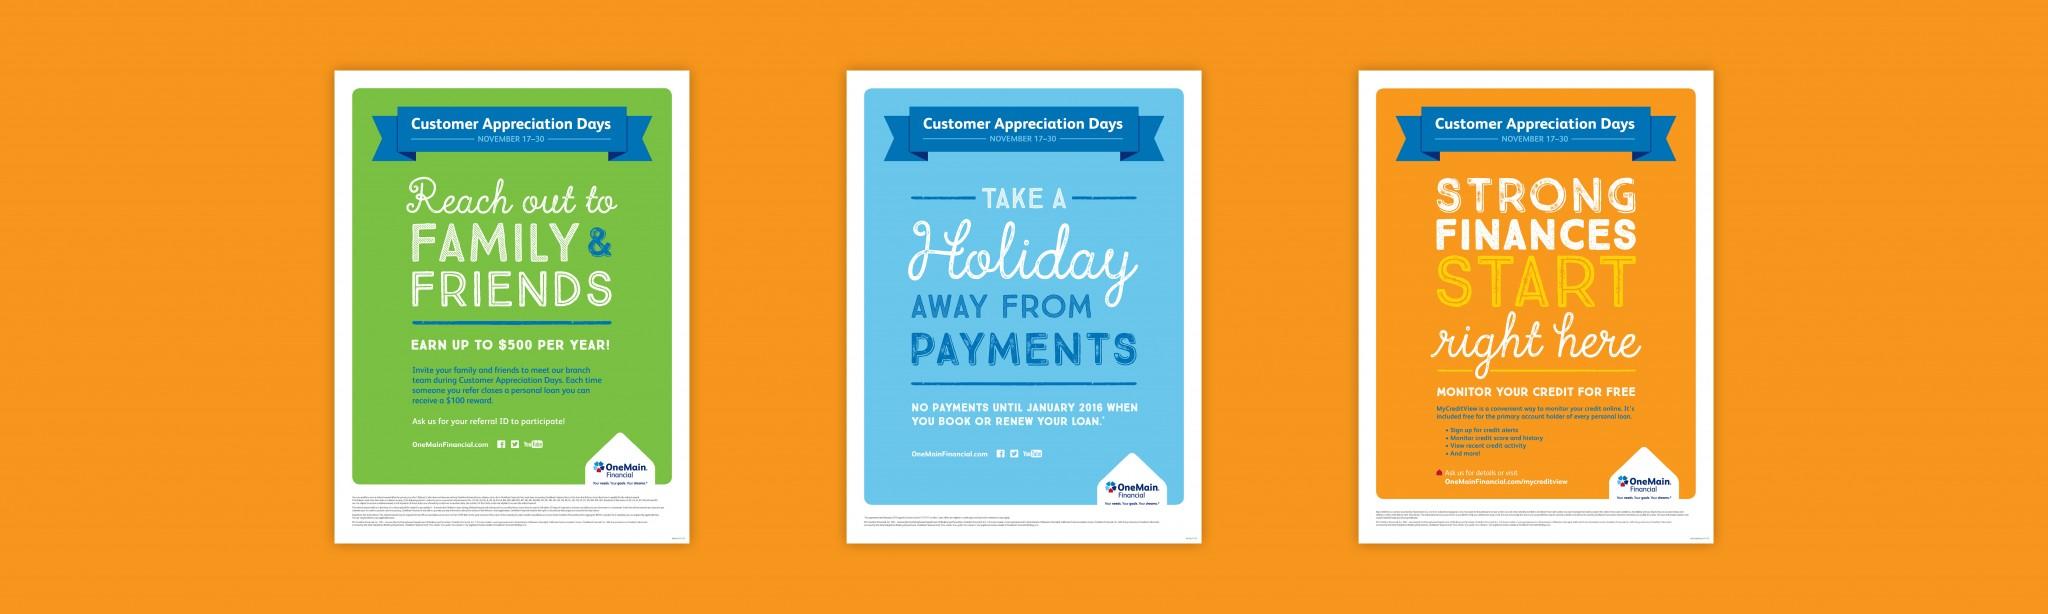 Onemain Customer Community Appreciation Days Orange Element